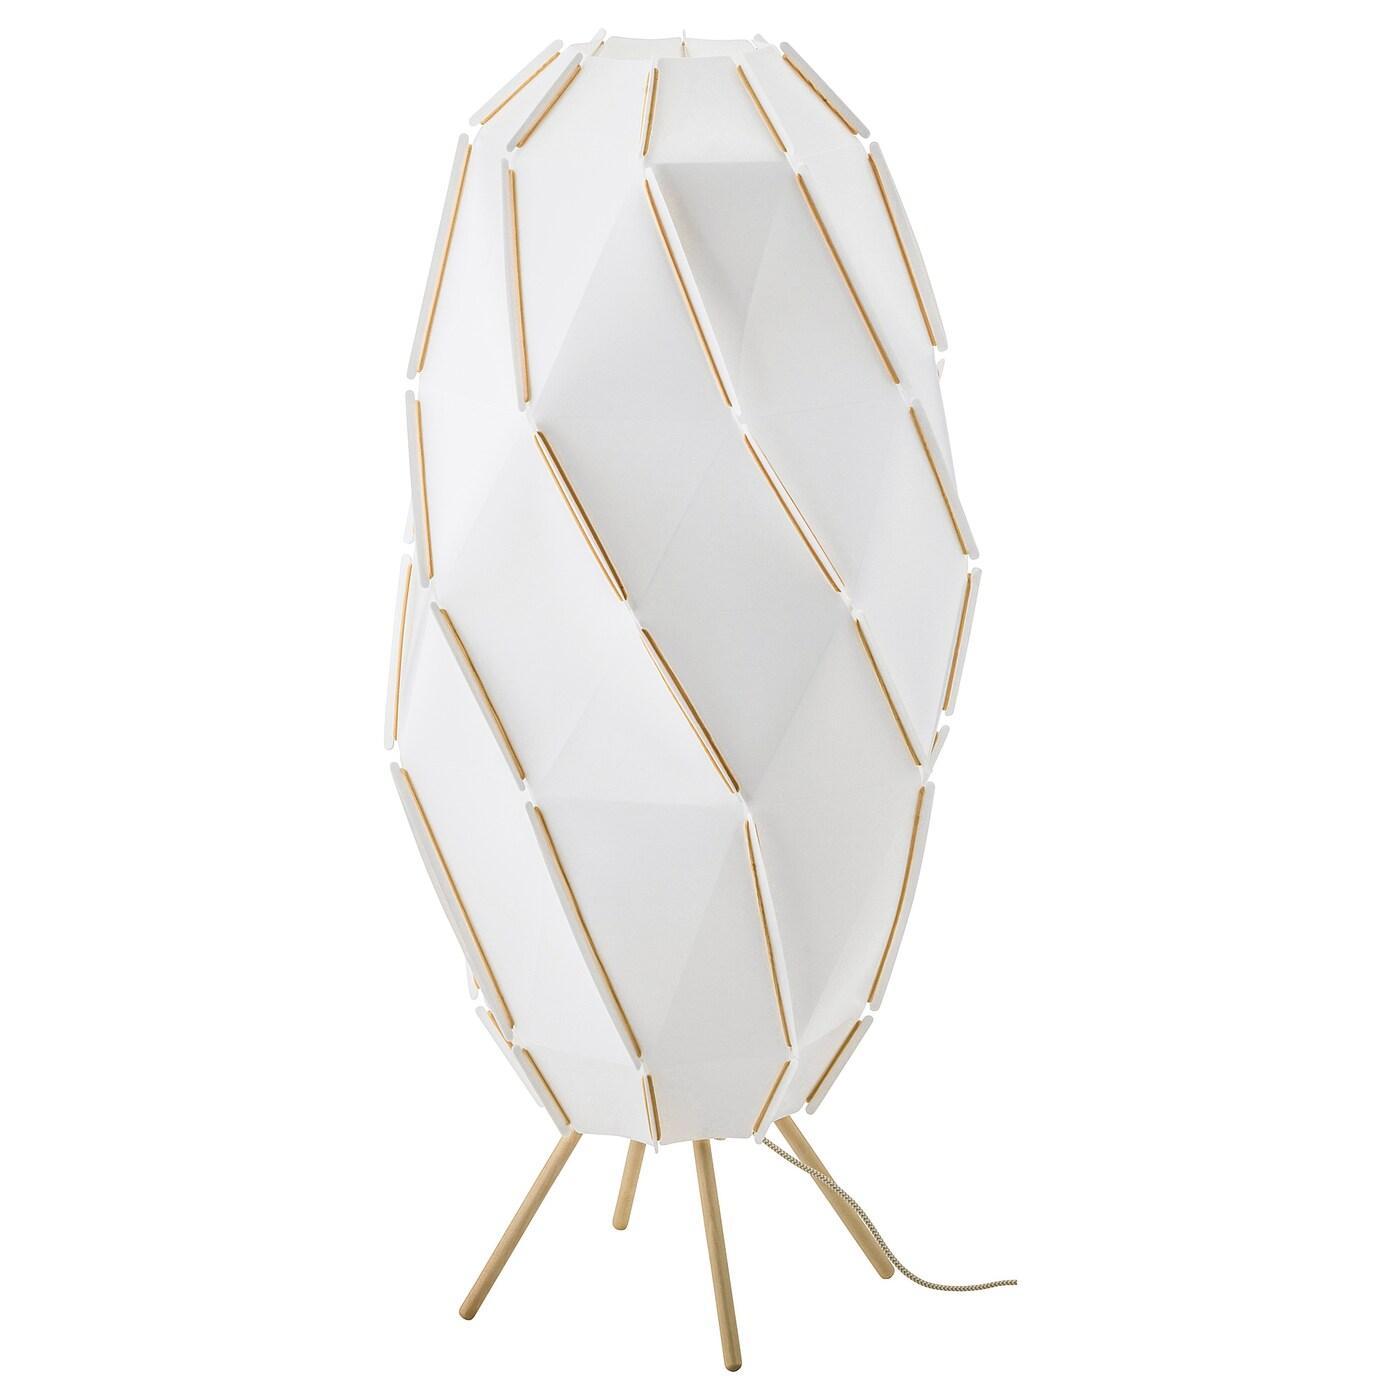 Ikea Stehlampe Papier Eckig